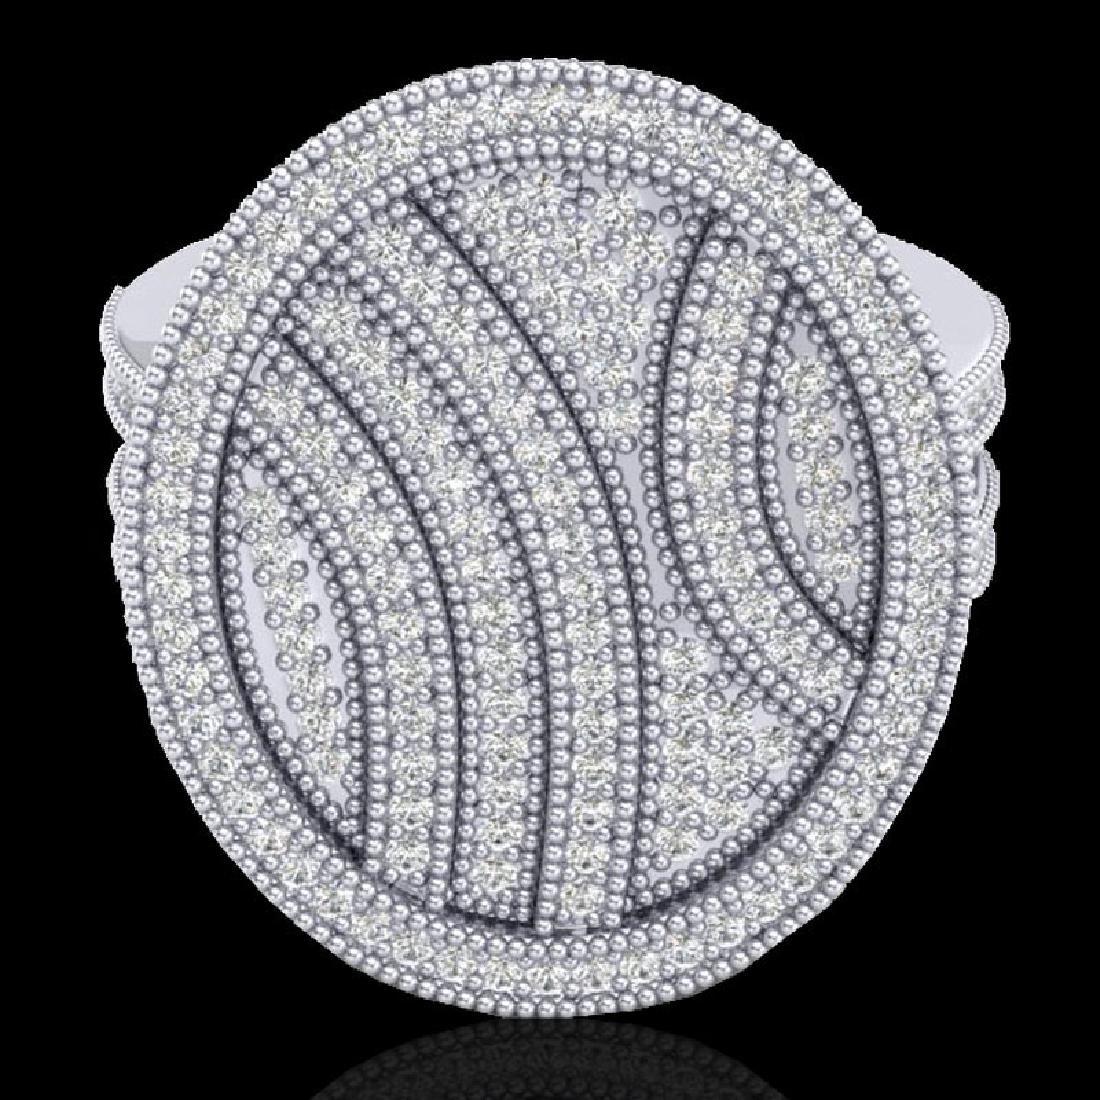 1.25 CTW Micro Pave VS/SI Diamond Ring 14K White Gold - 2